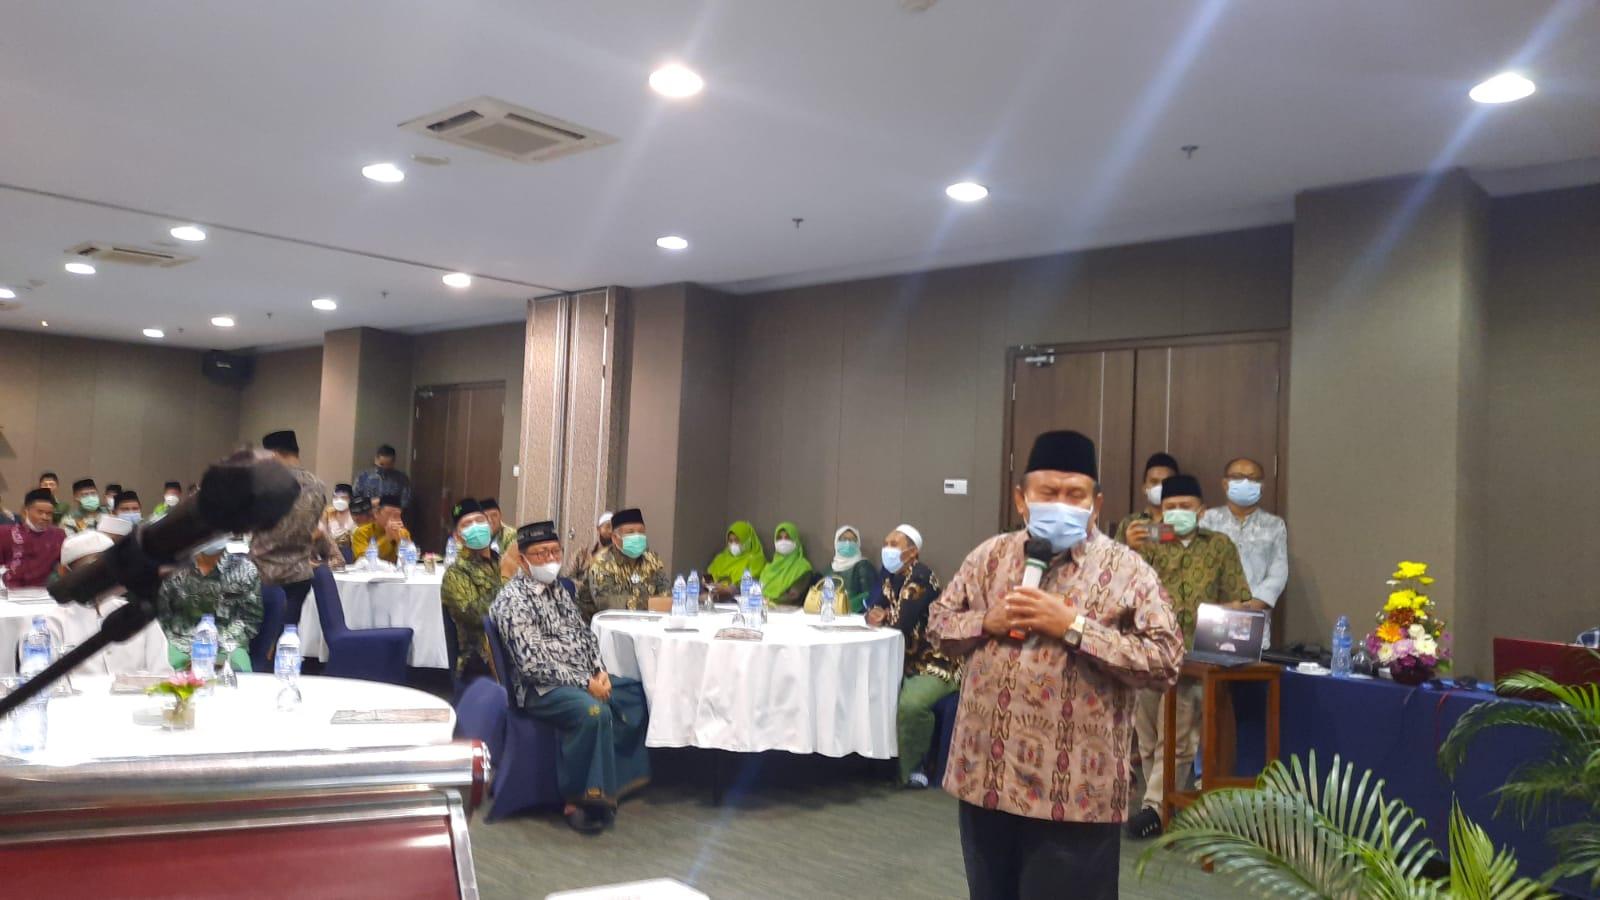 Pengurus Wilayah dan Cabang Nahdlatul Ulama se-Sumatra Selatan kompak mendukung KH Yahya Colil Staquf (Gus Yahya) menjadi Ketua Umum PBNU